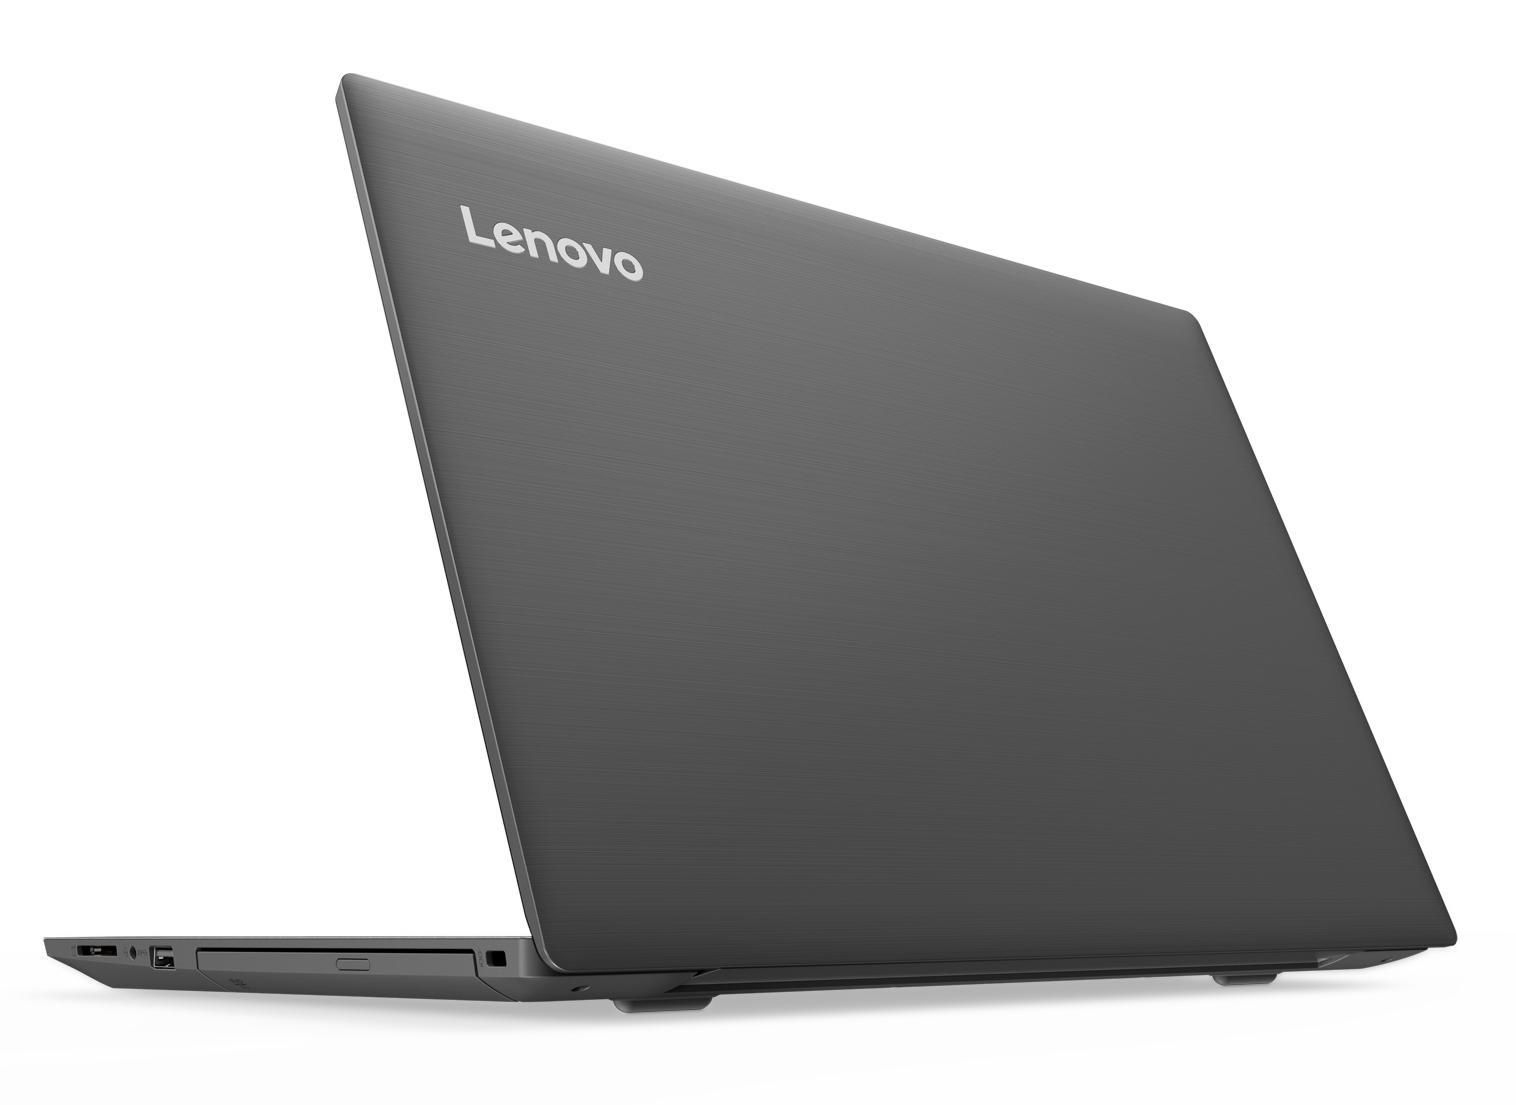 Lenovo laptop drivers for windows 7 32 bit free download